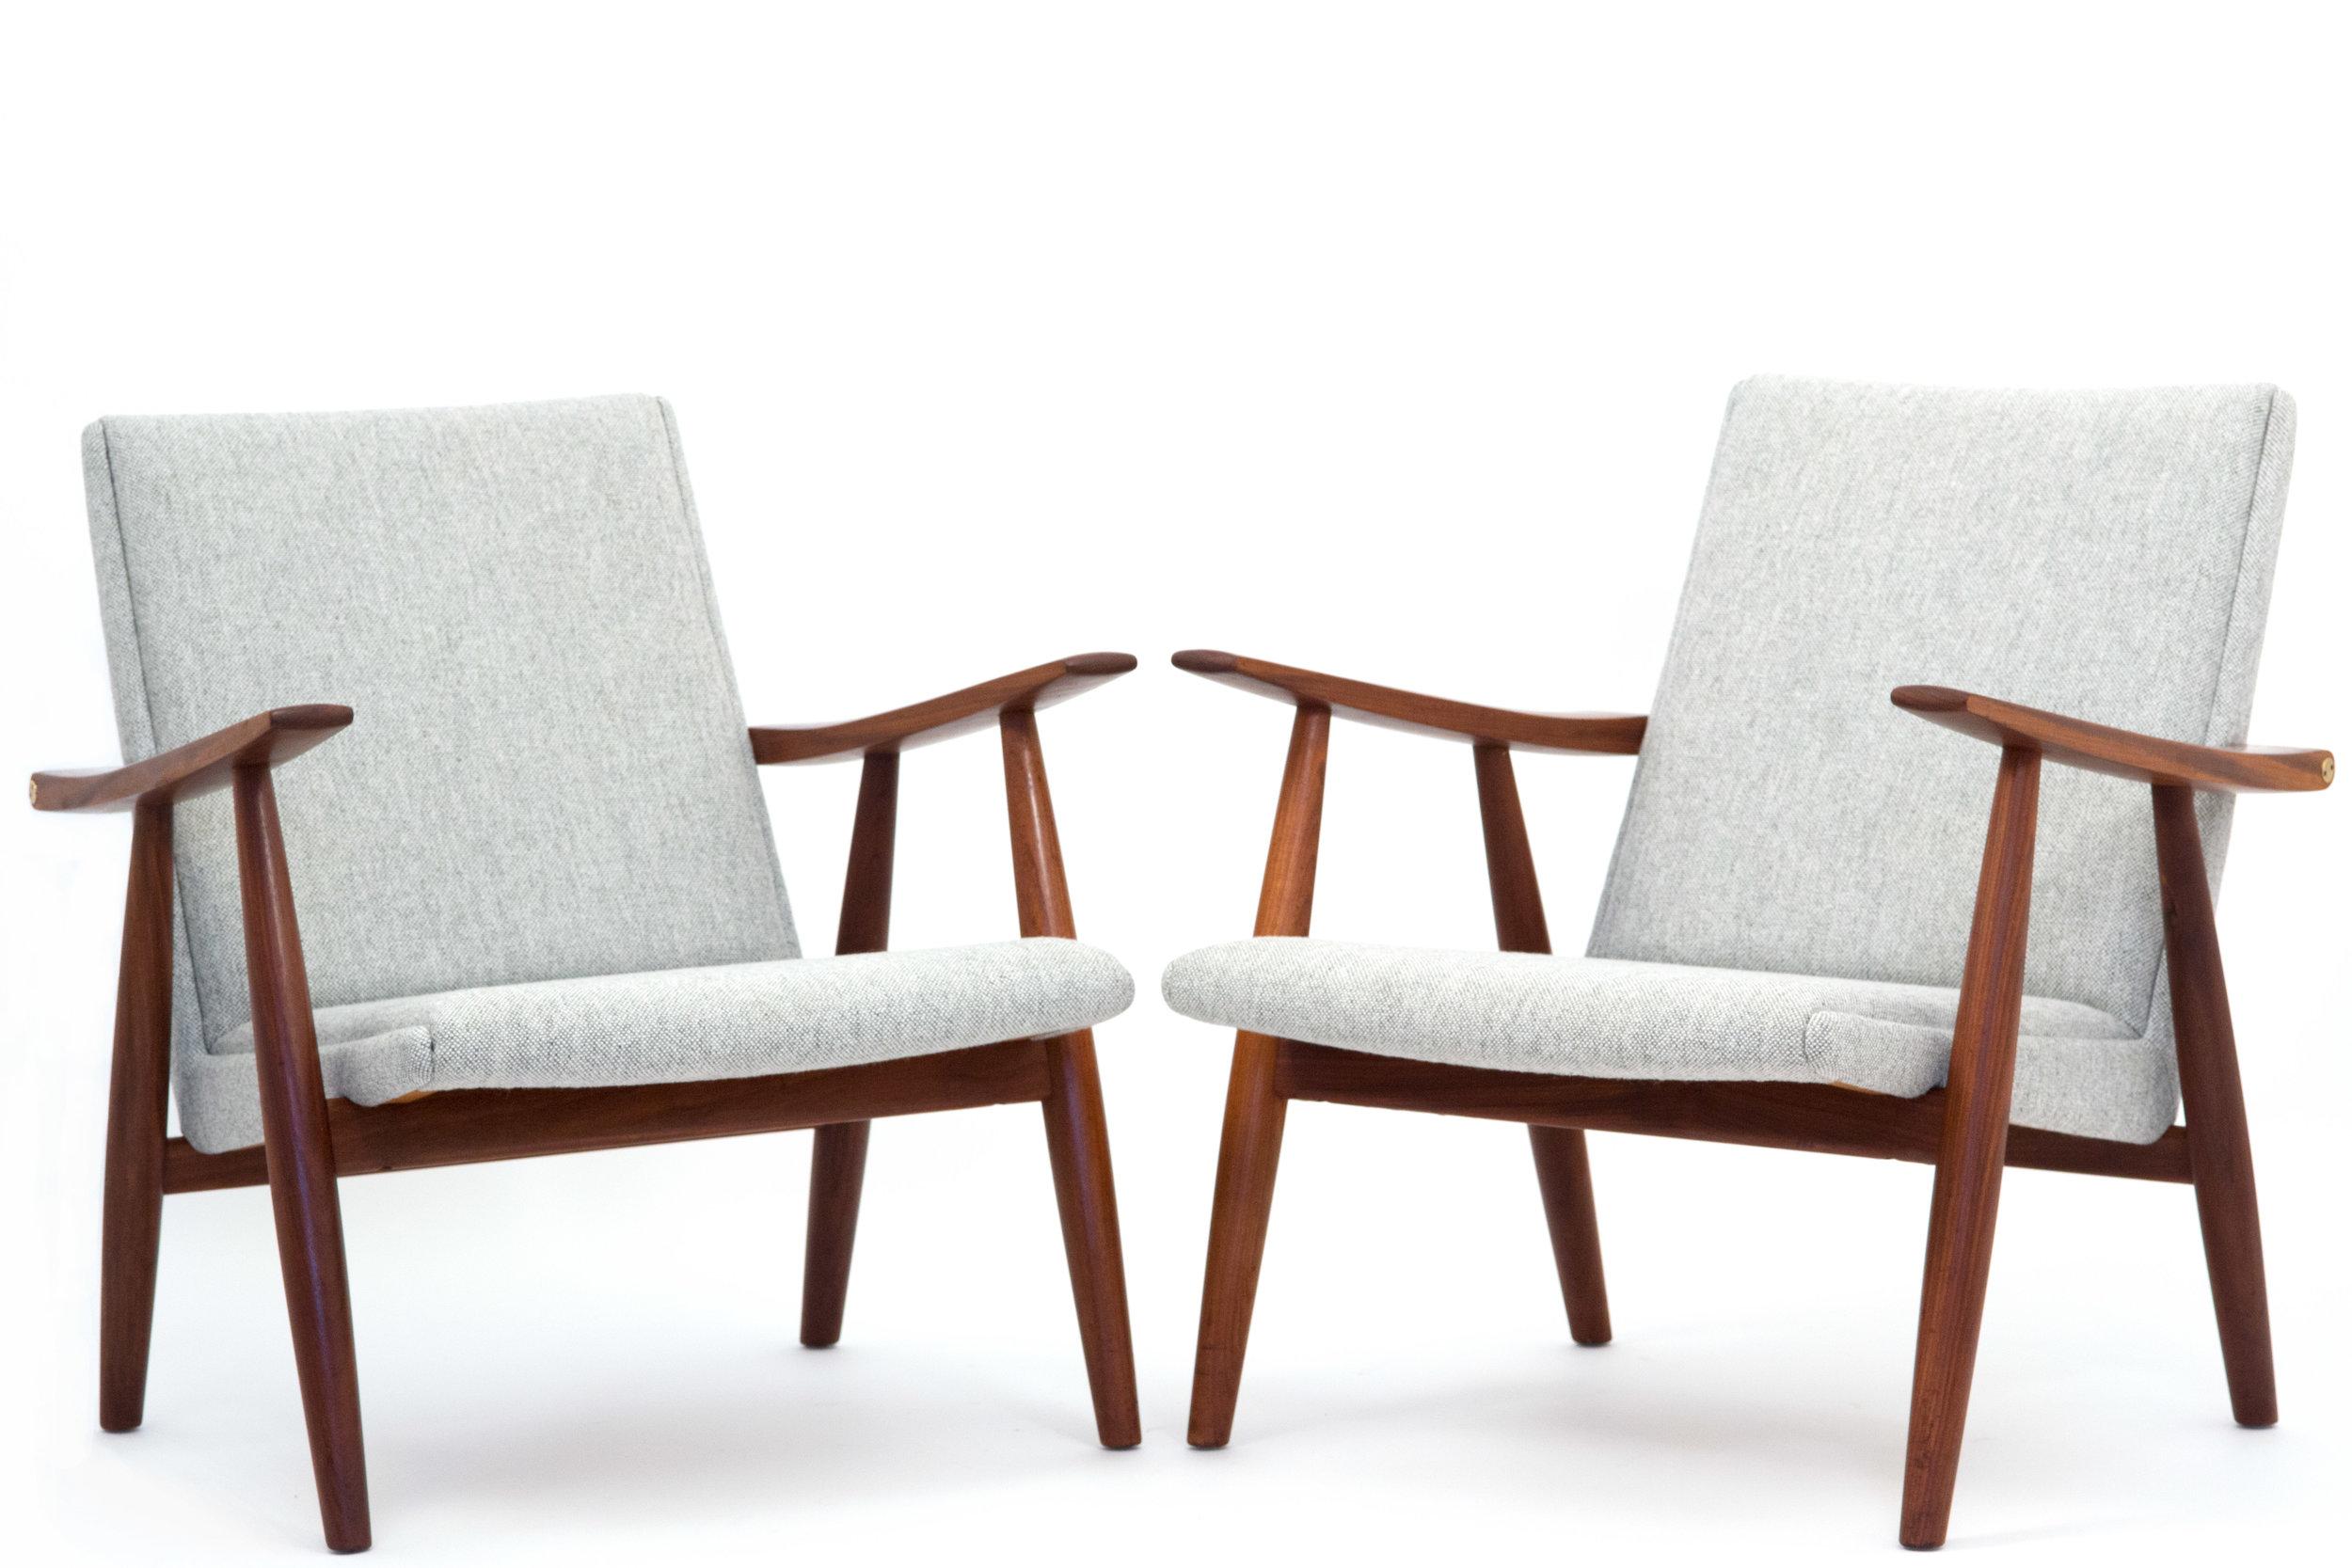 2x Grey chairs copy2.jpg